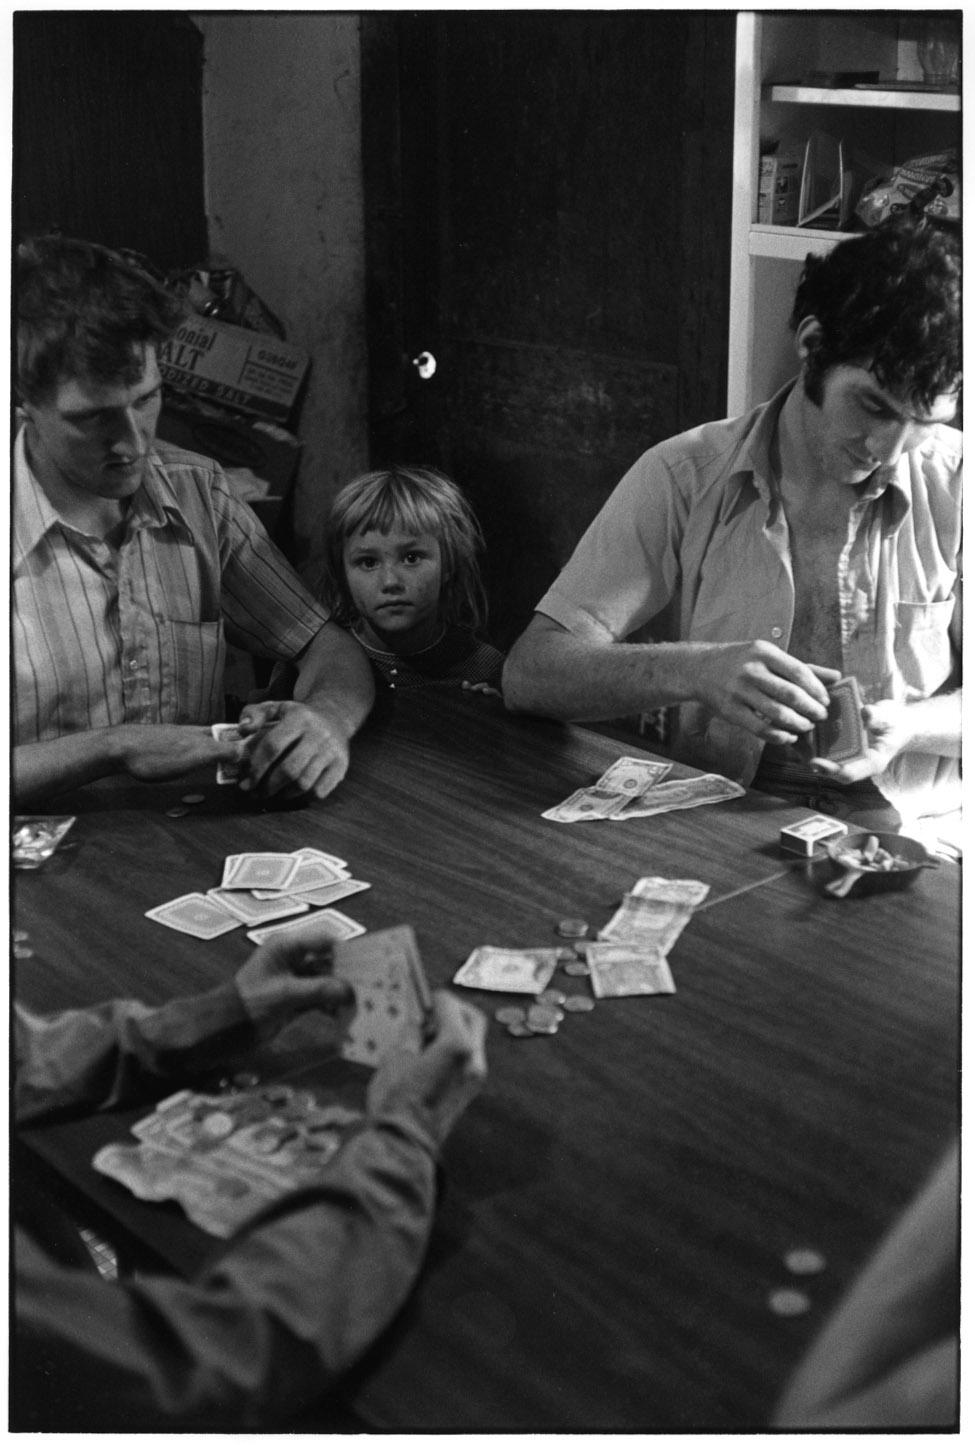 Poker game; little girl looking at camera, 1972©Duke University David M. Rubenstein Rare Book & Manuscript Library